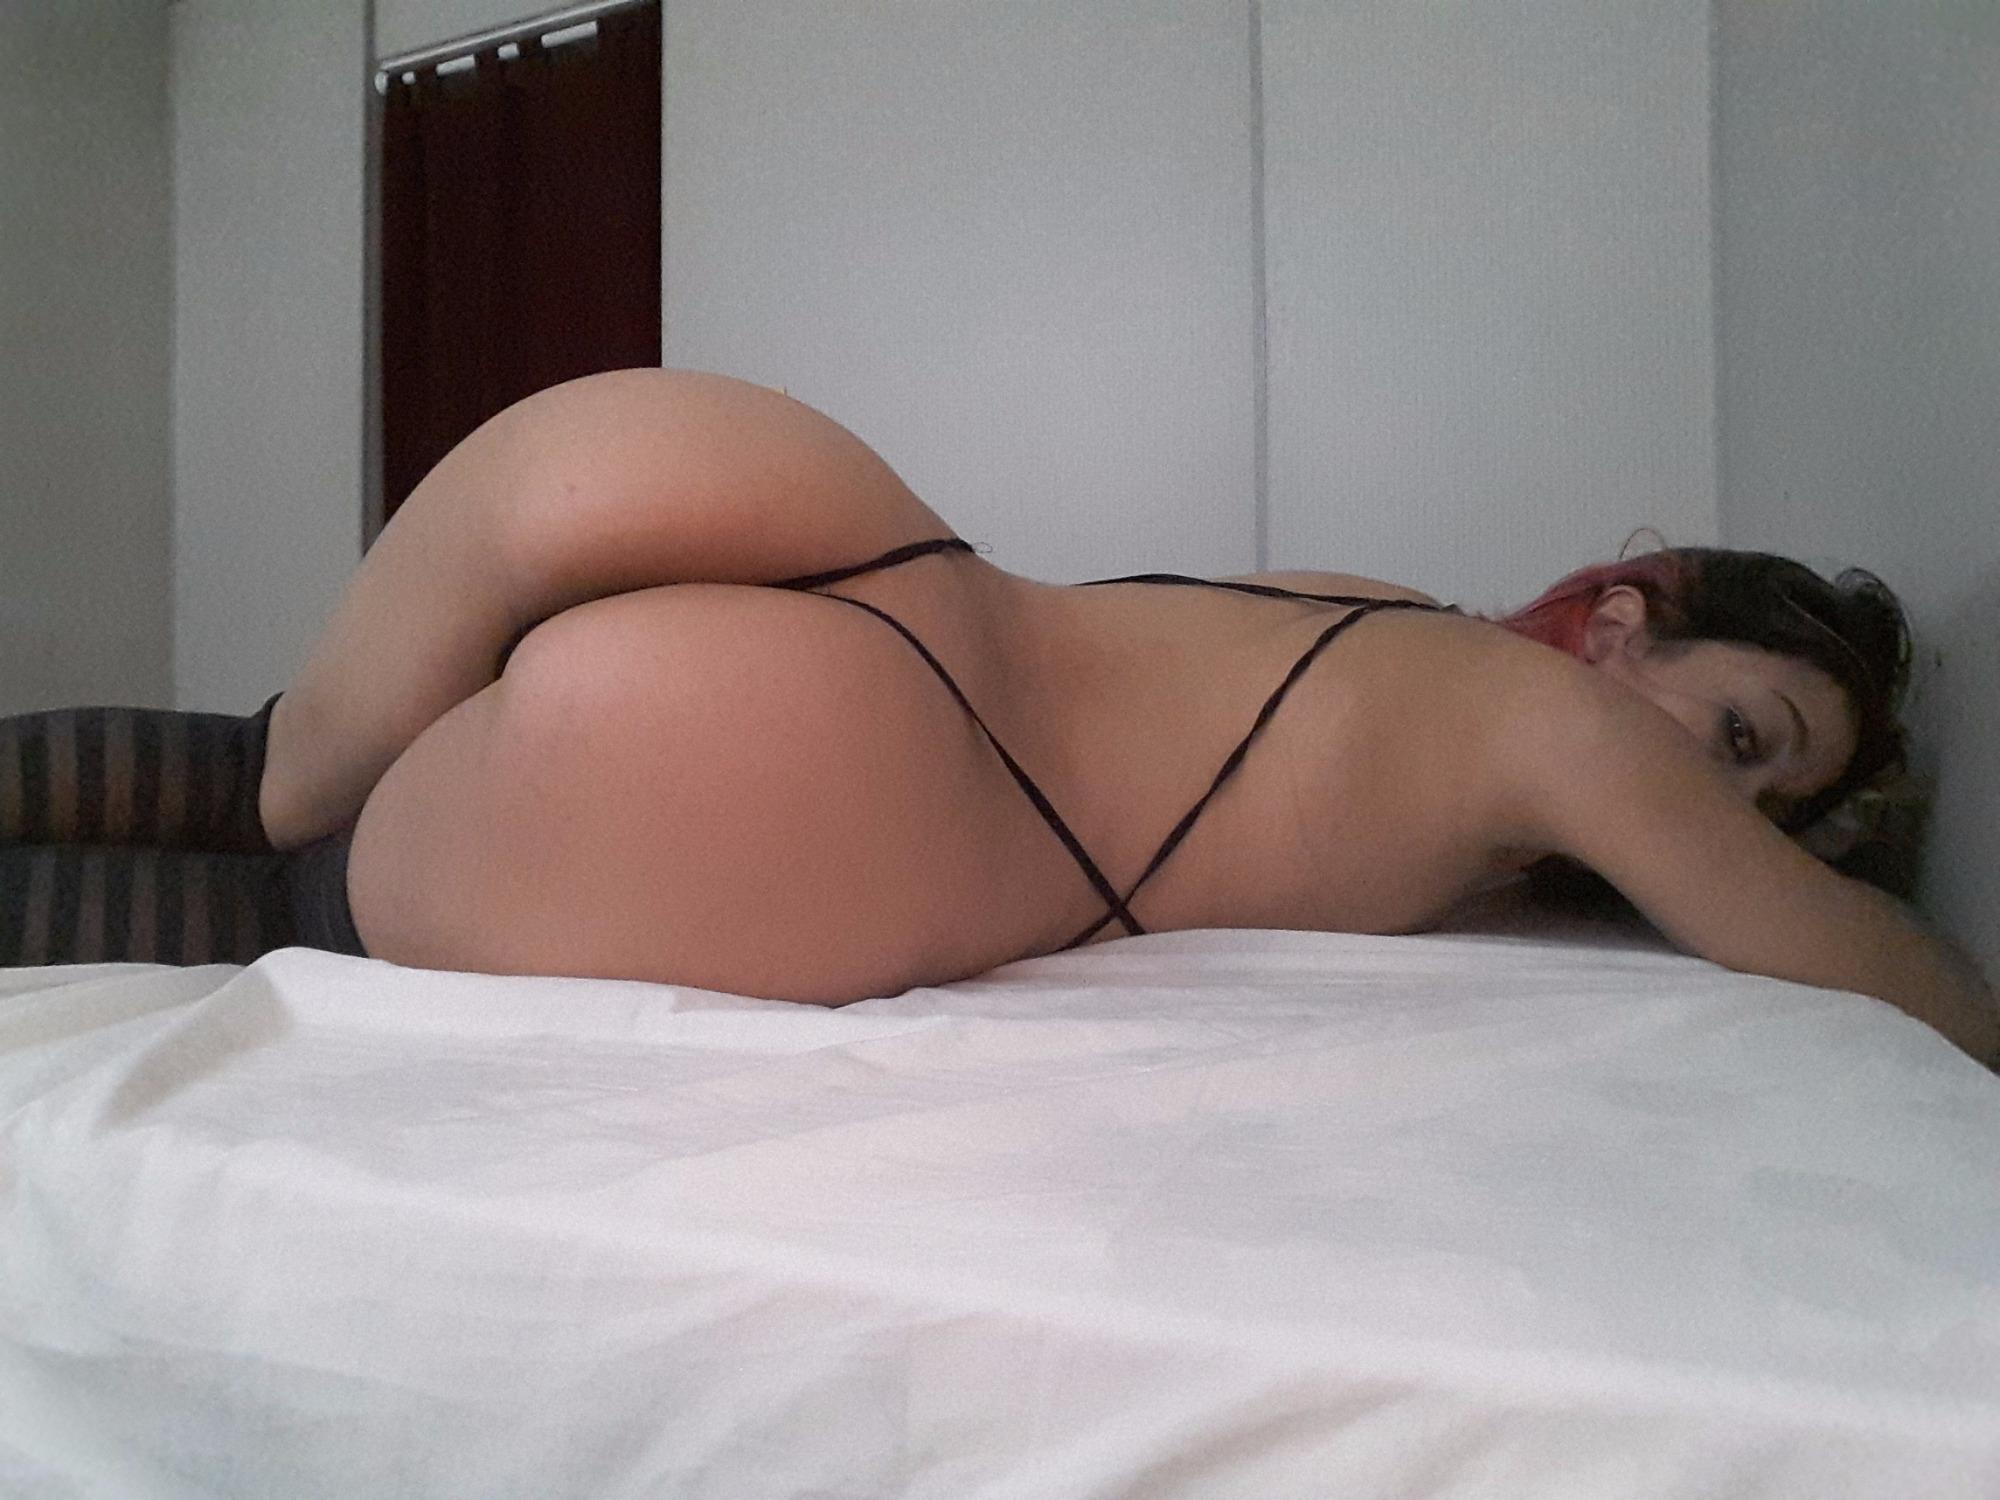 porno video sexiga skor